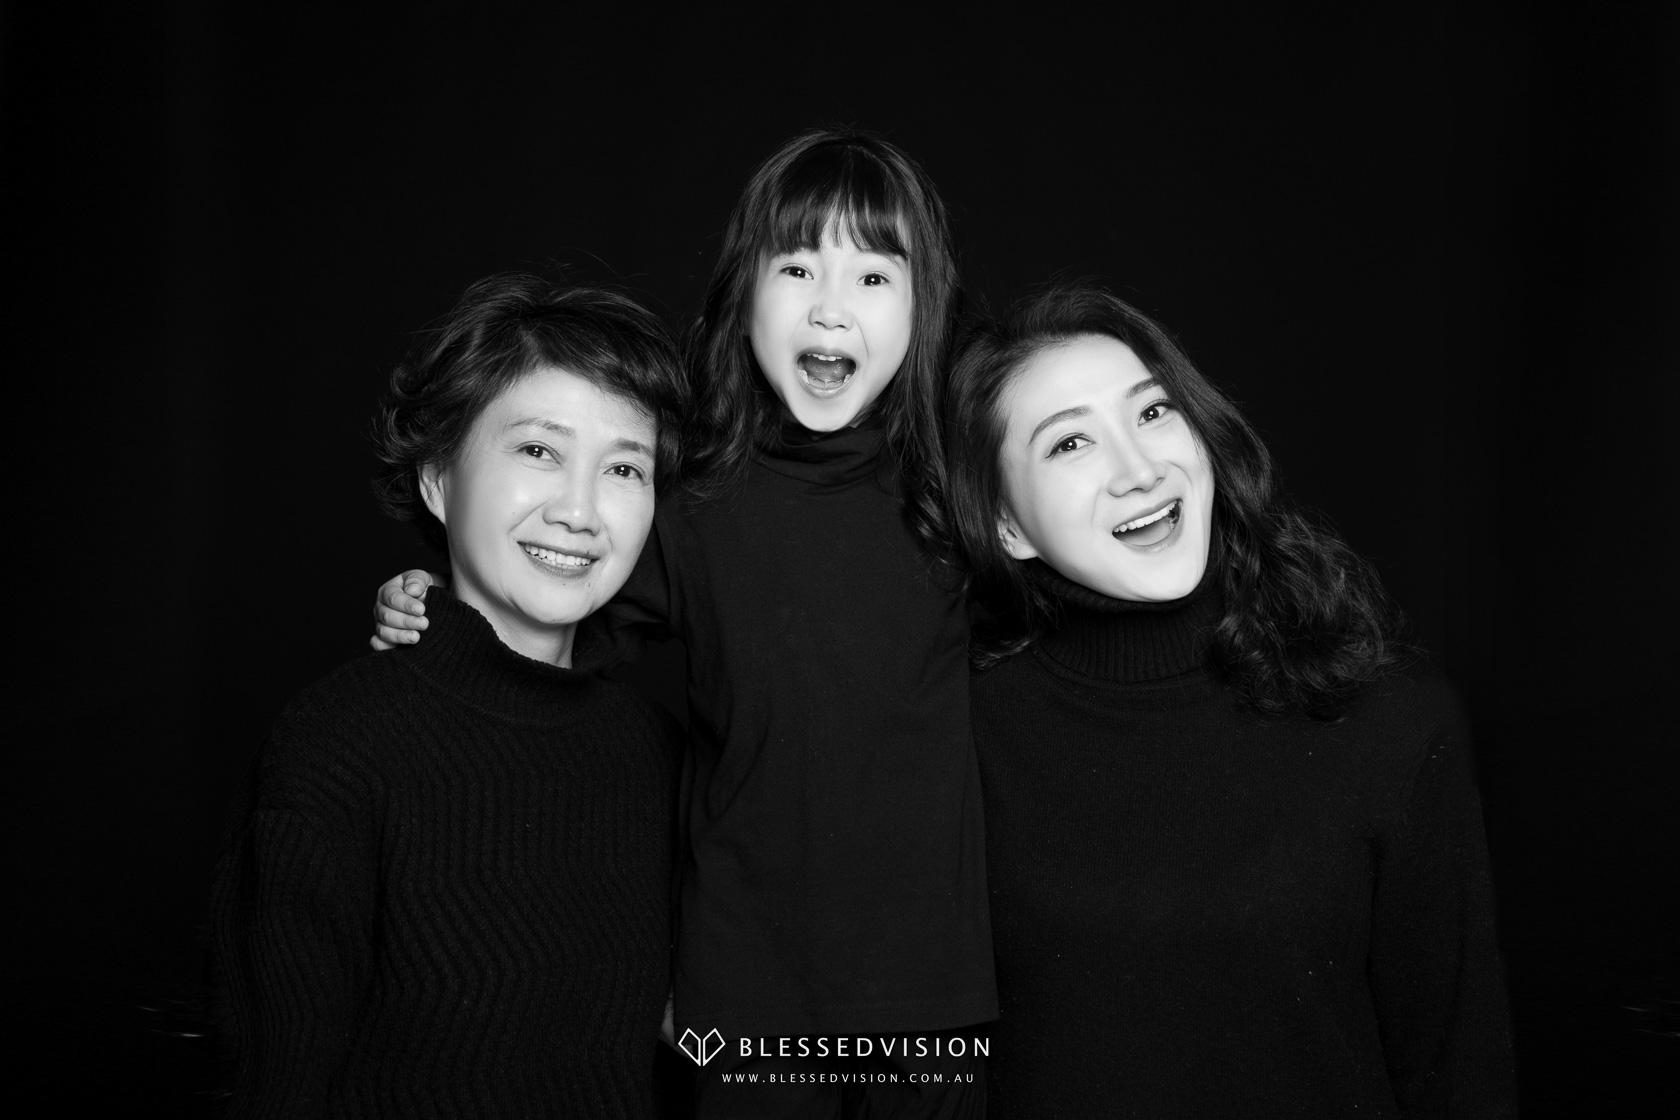 Studio Photography family baby newborn portrait photography Blessed Vision 人像摄影 宝宝照 棚拍 孕妇照 中国风 (1 of 29)